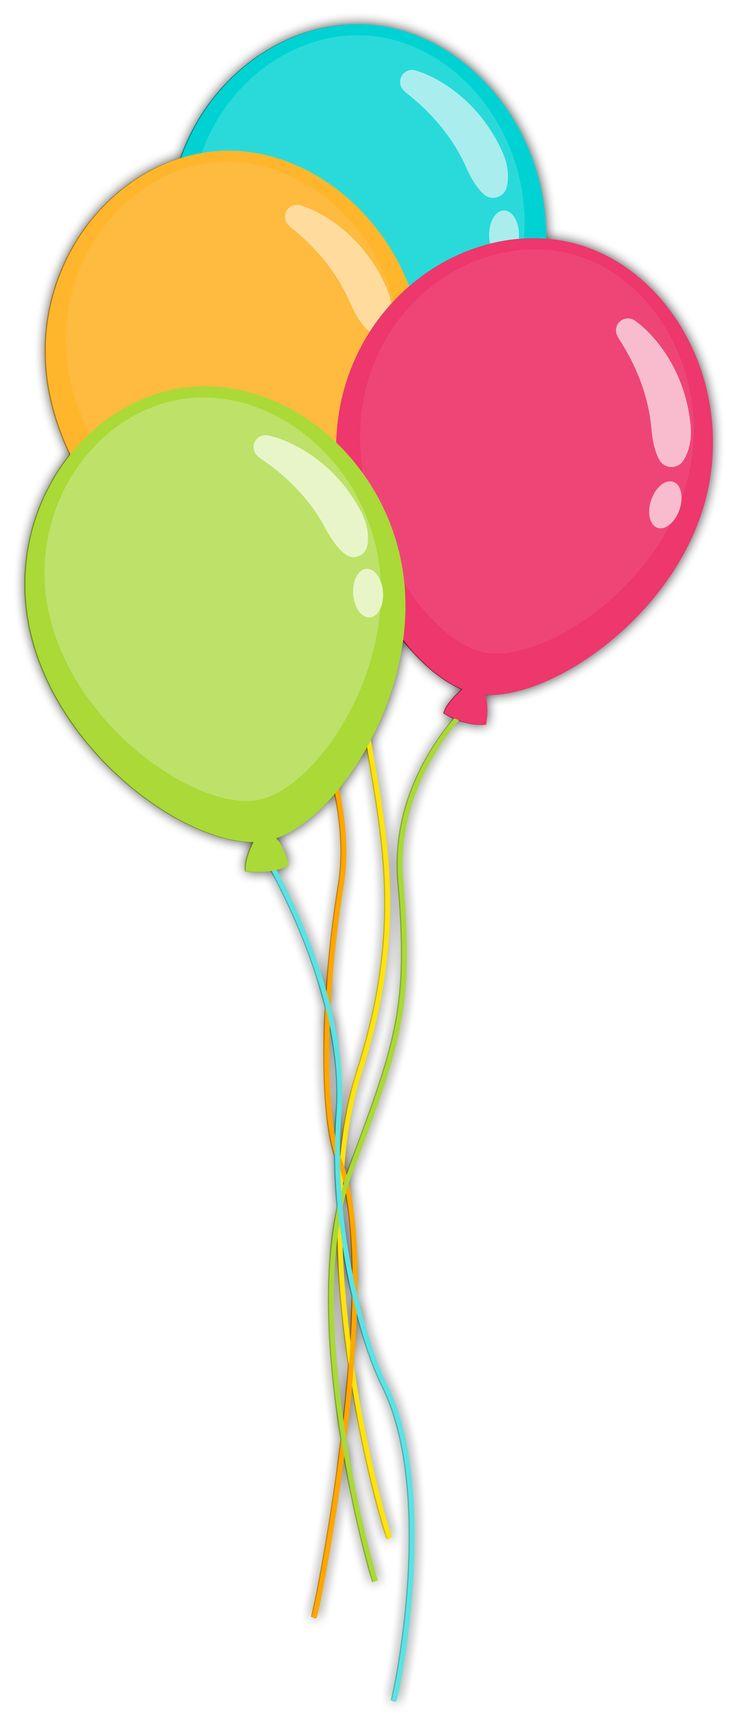 Balloon clipart 2 » Clipart Station.